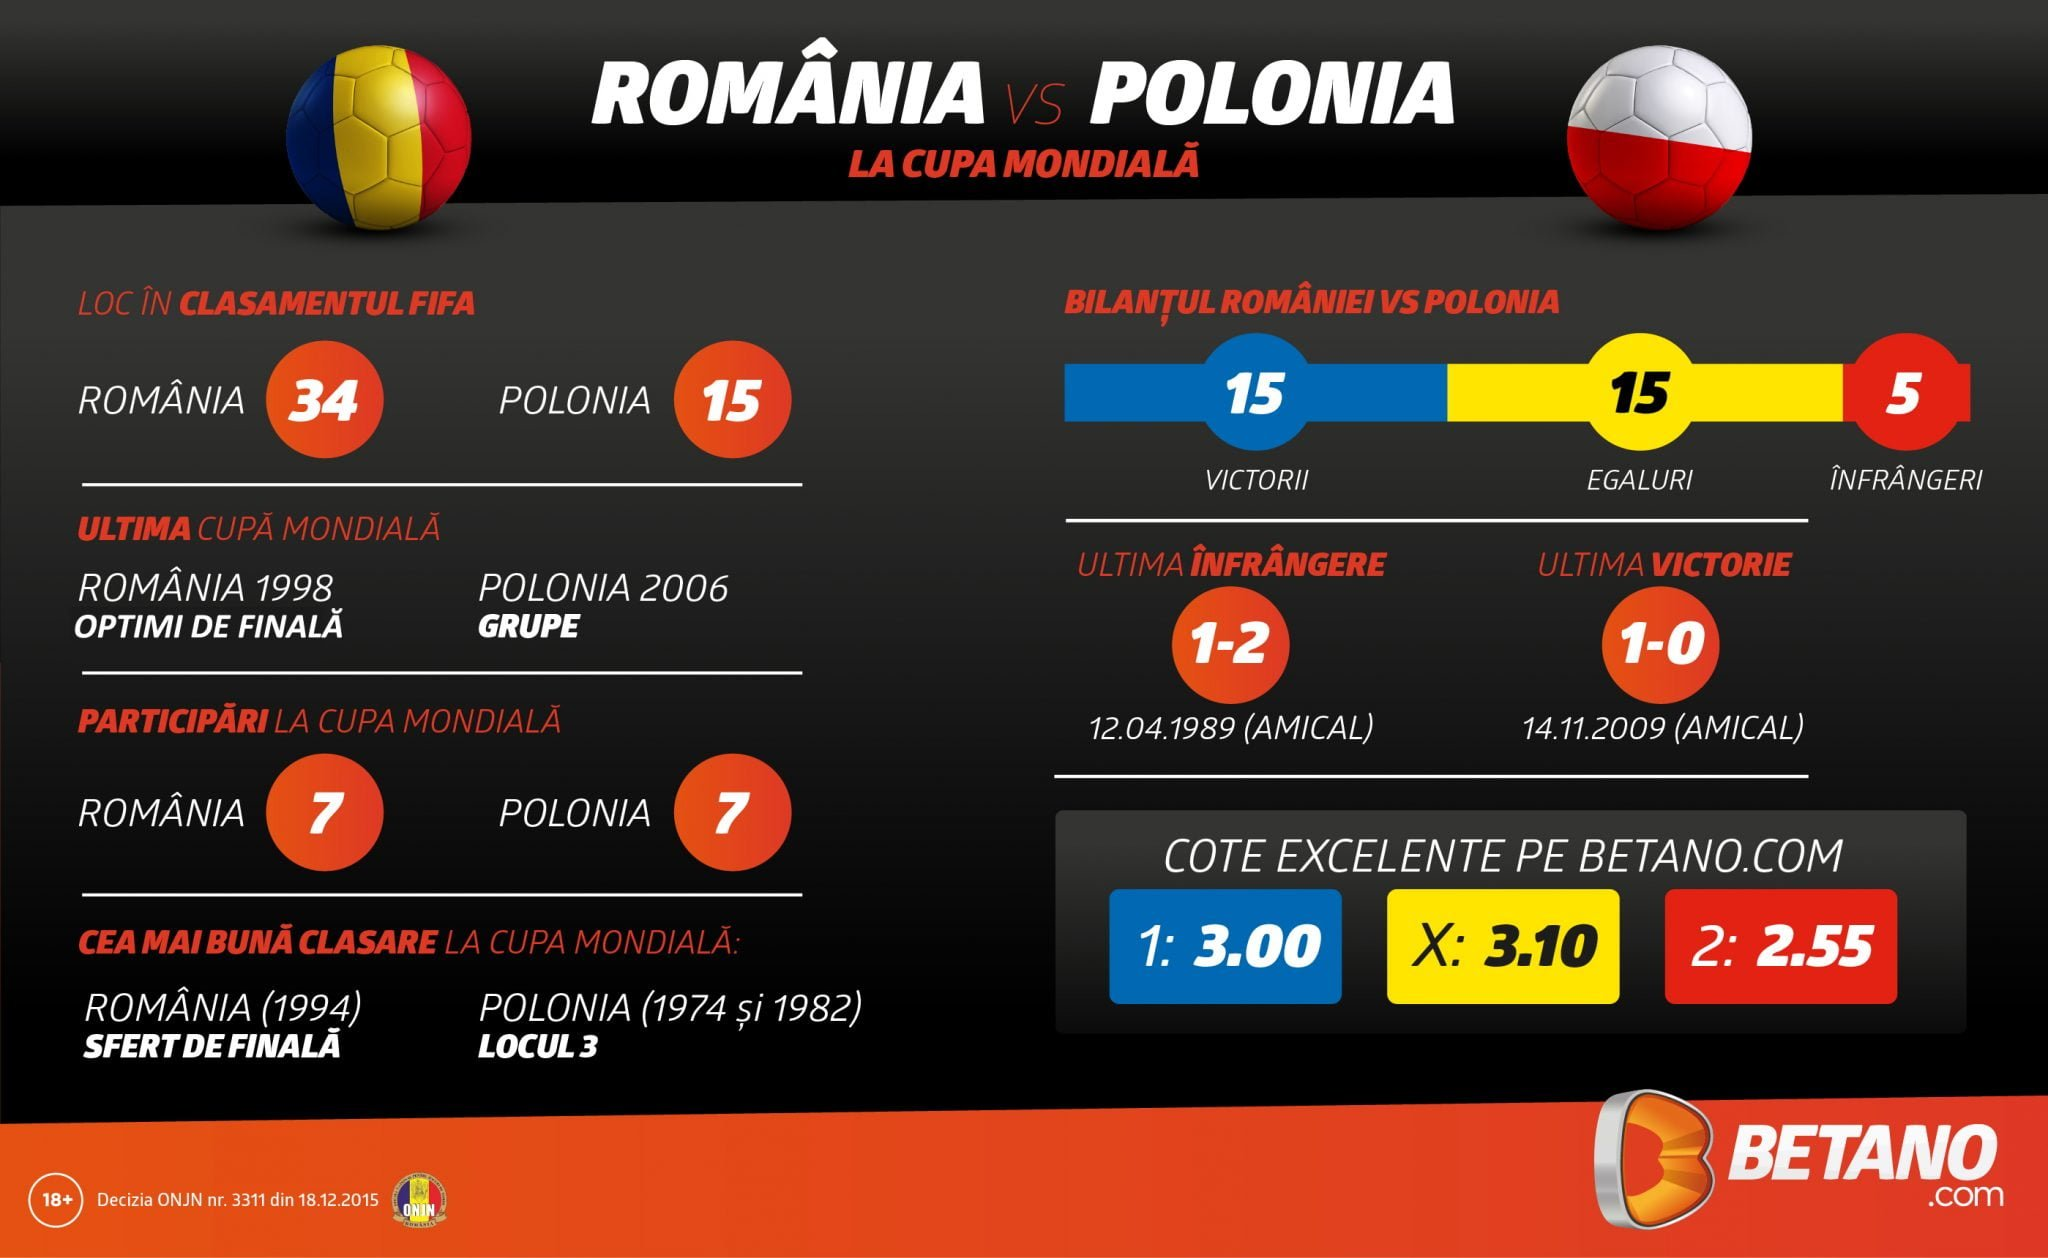 betano_ro-romania-polonia-ce-se-poate-paria-la-acest-meci